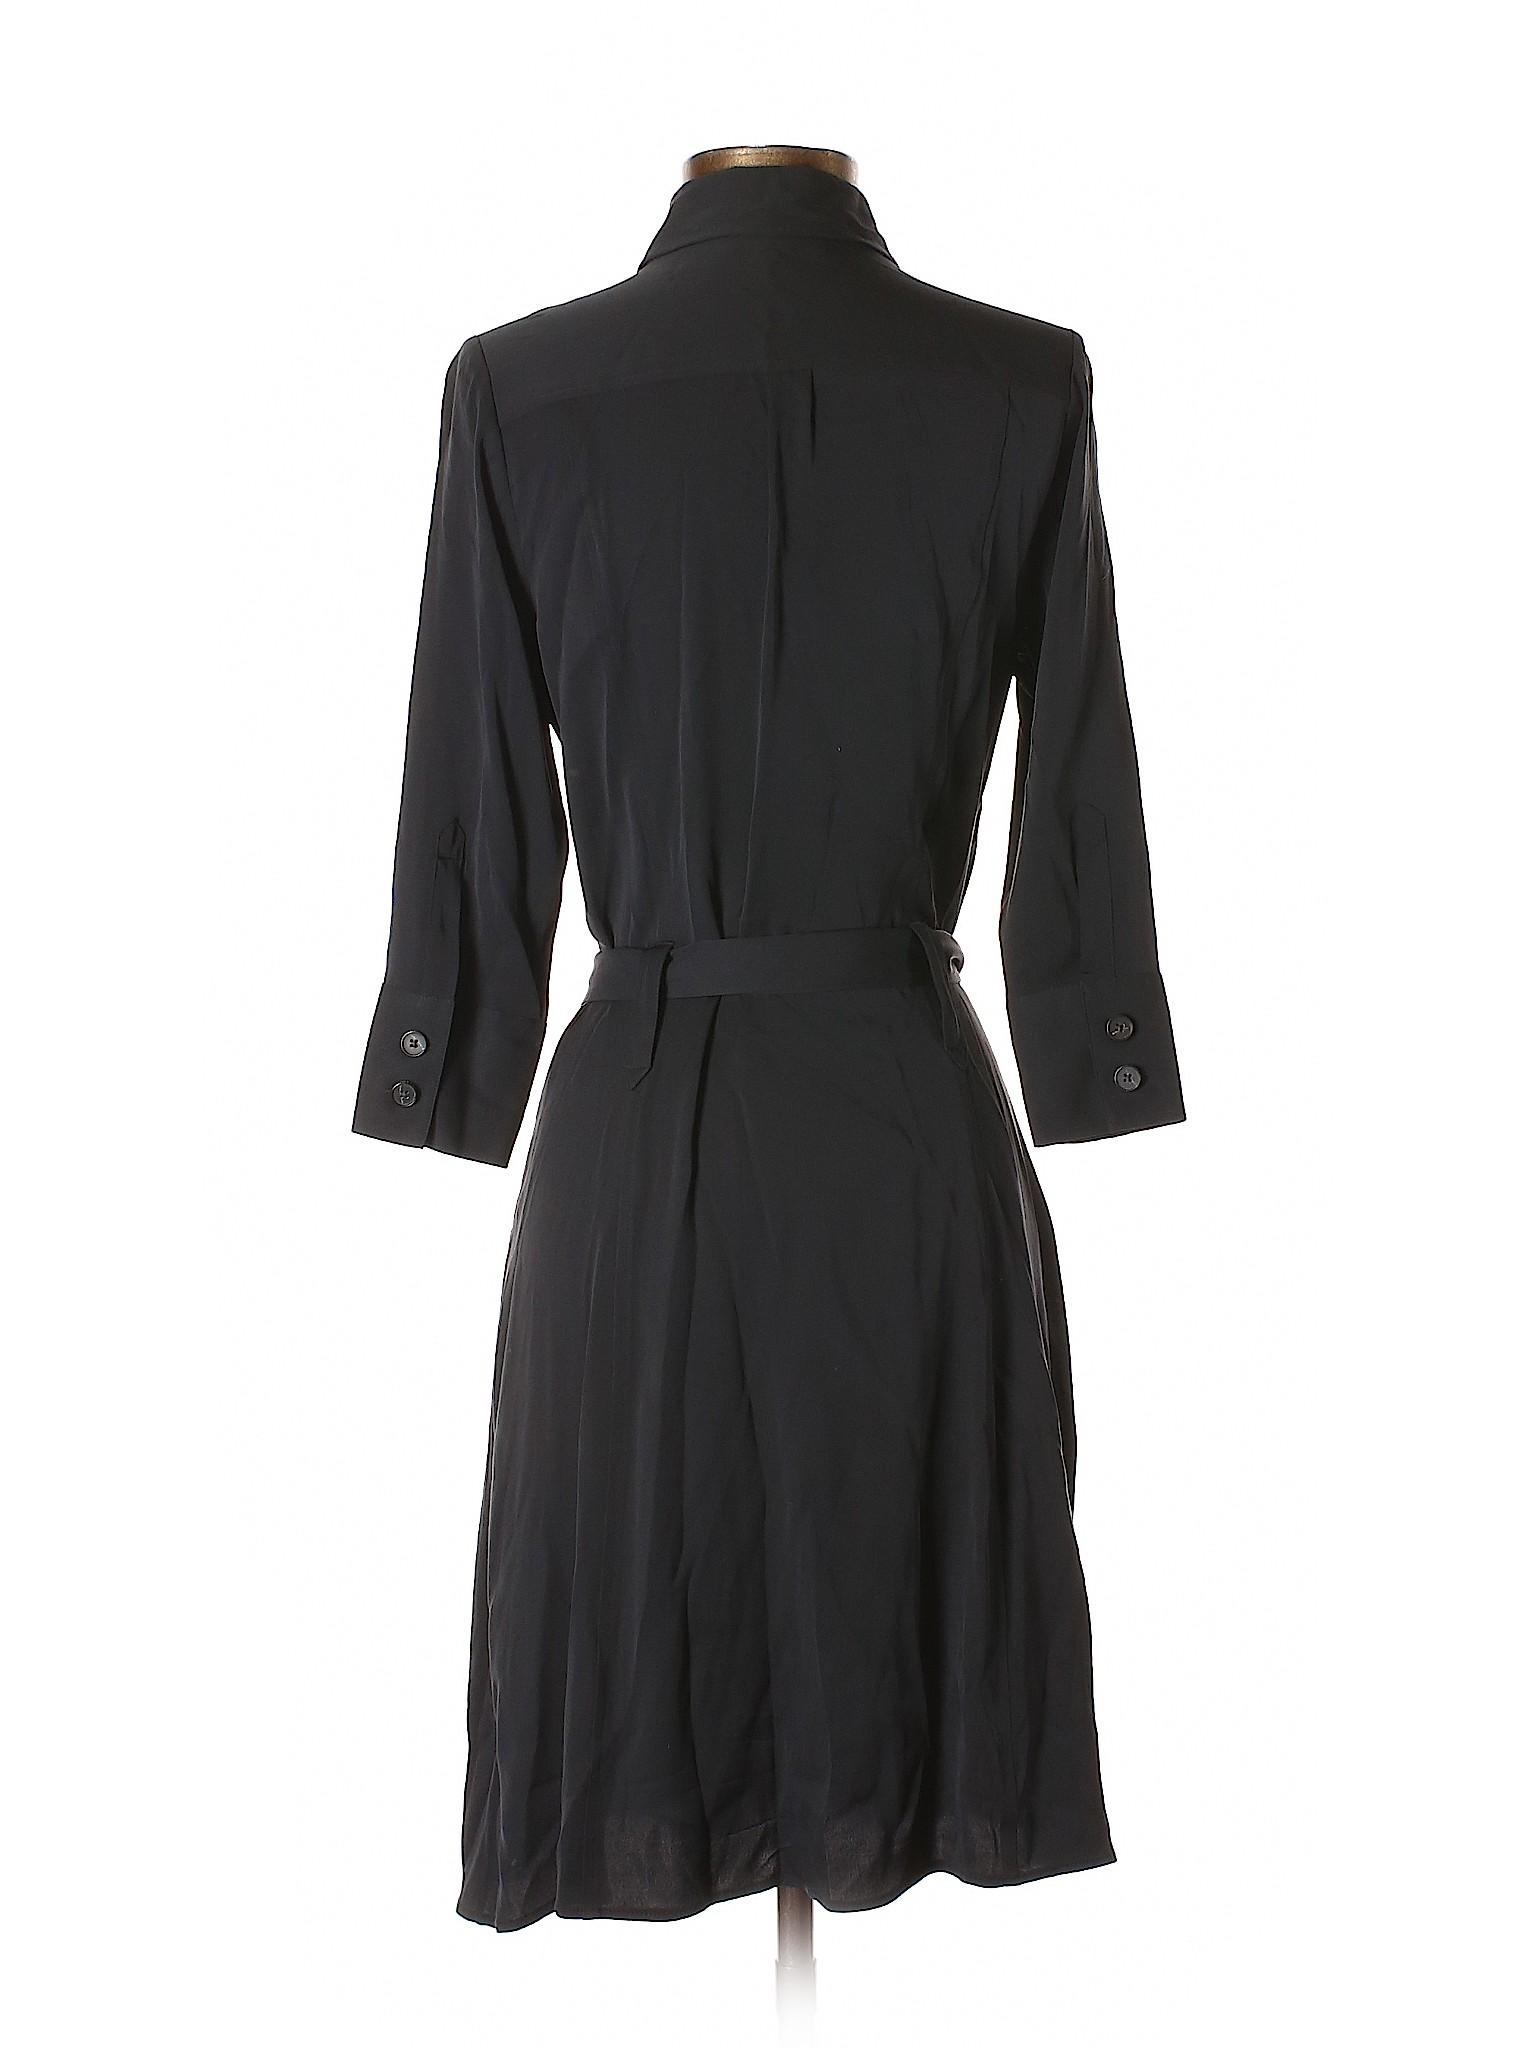 amp; Republic Selling Casual Dress Rock gq11wUS